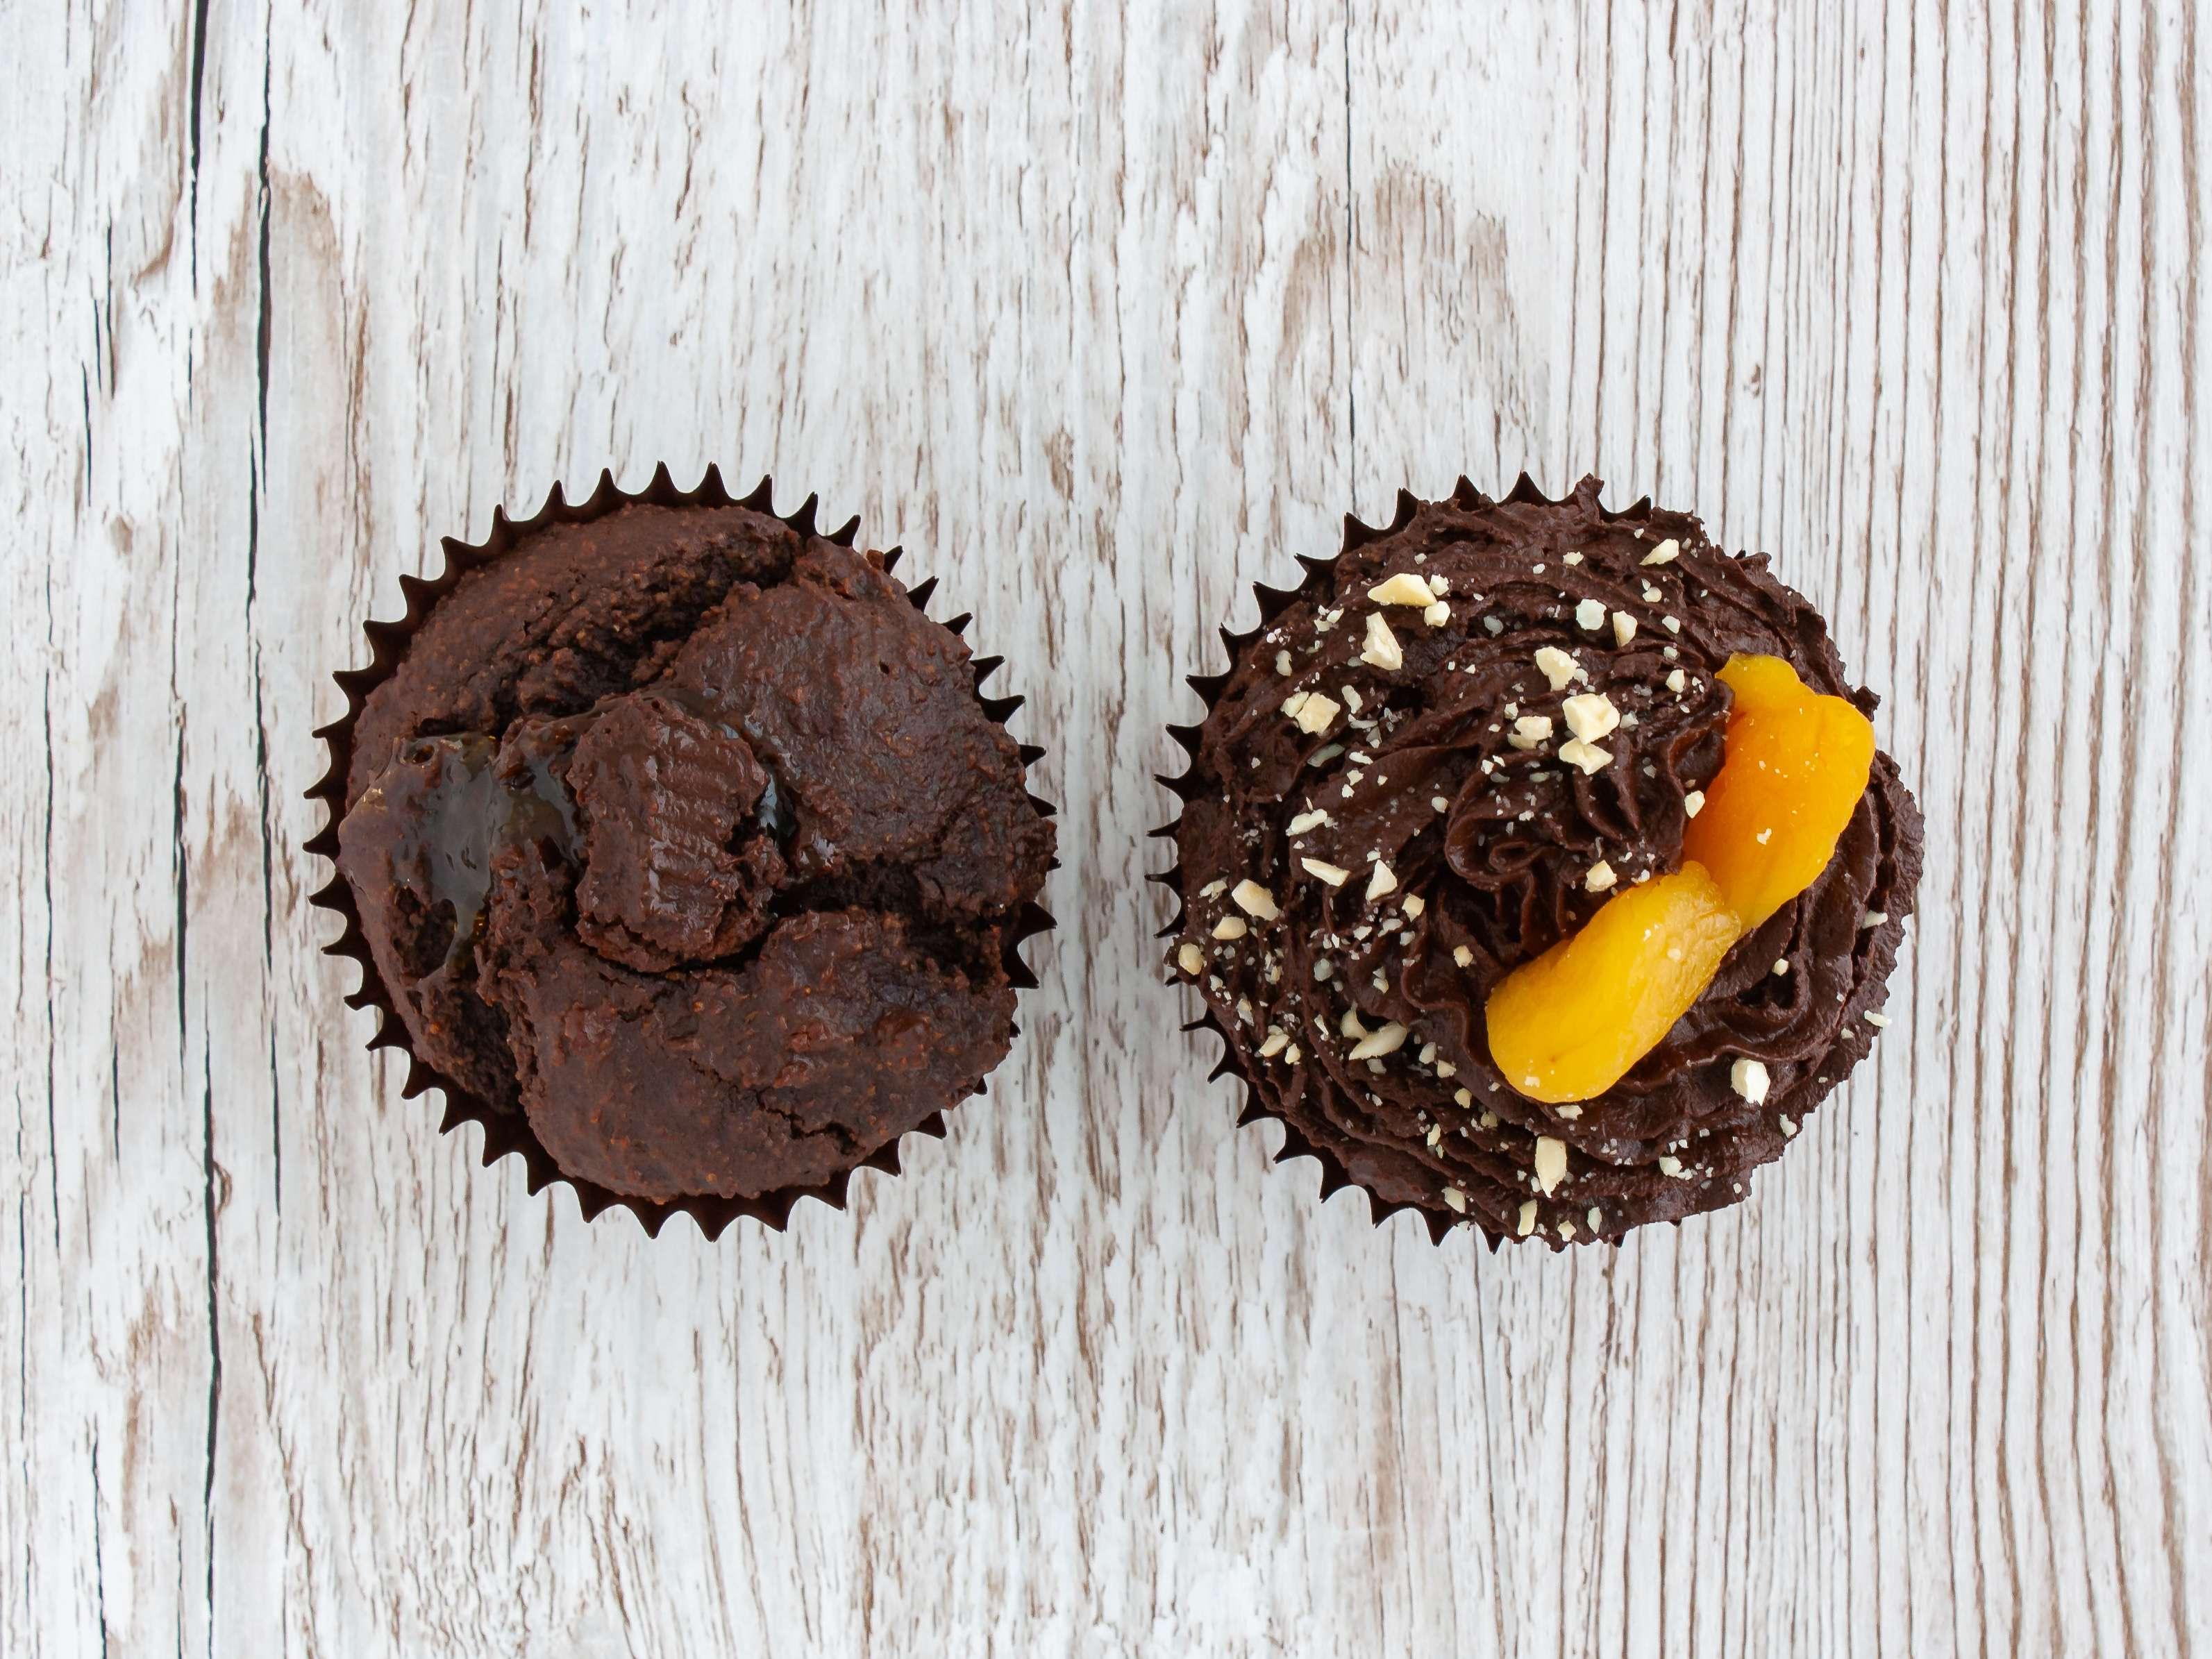 Step 5.2 of Gluten Free Vegan Chocolate Cupcakes with Apricot Jam Recipe